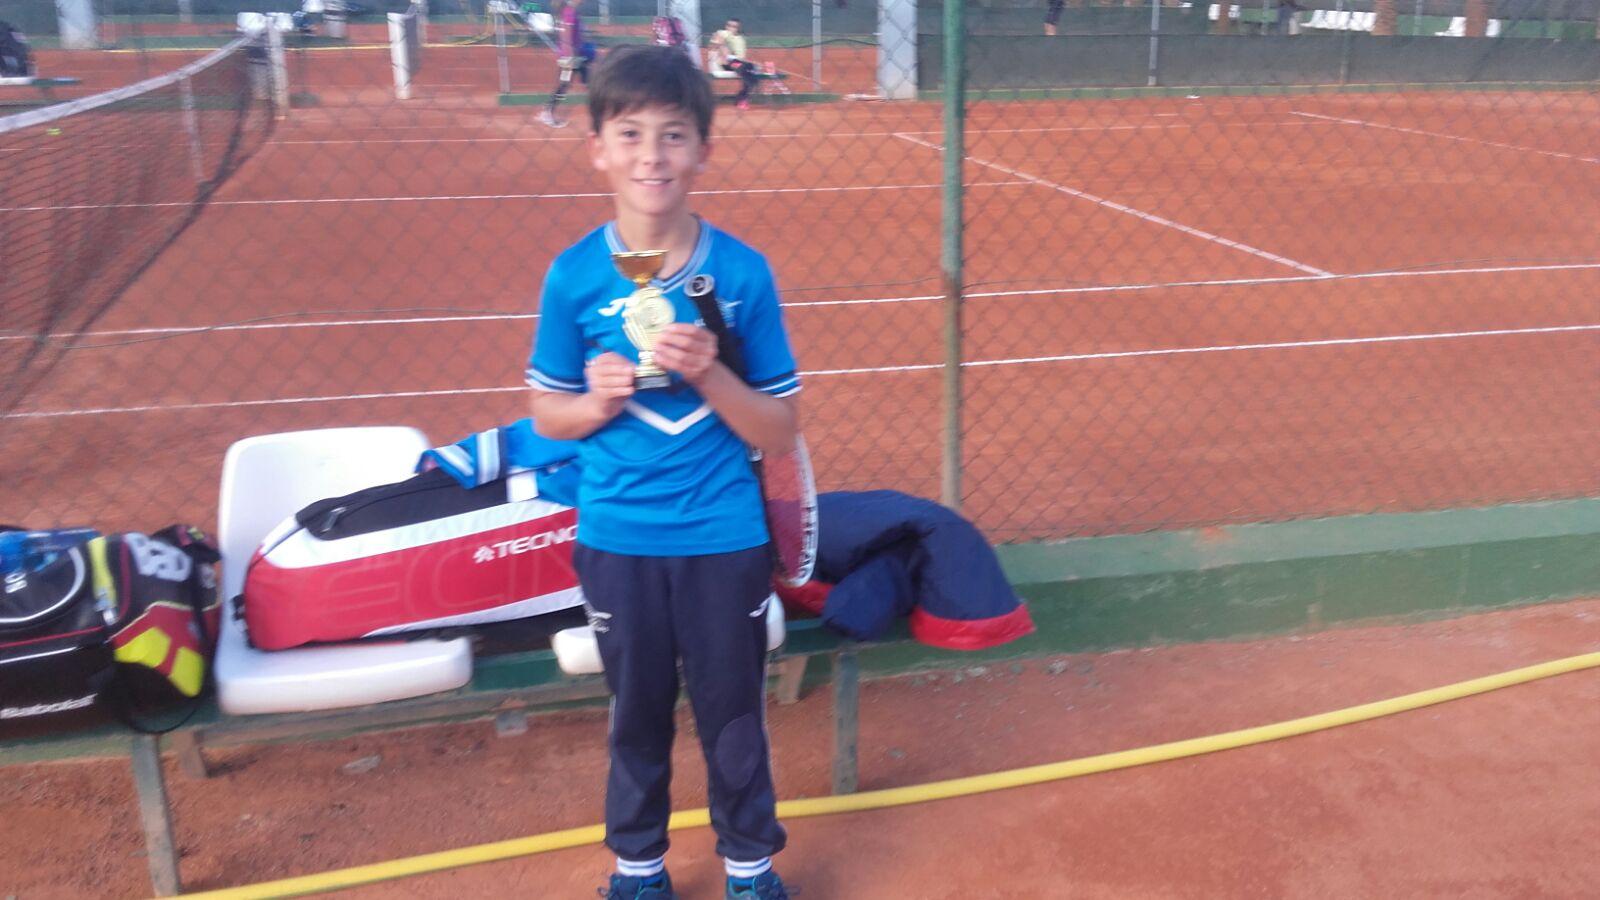 Circuito Tenis : Club de tenis petrer circuito alicantino